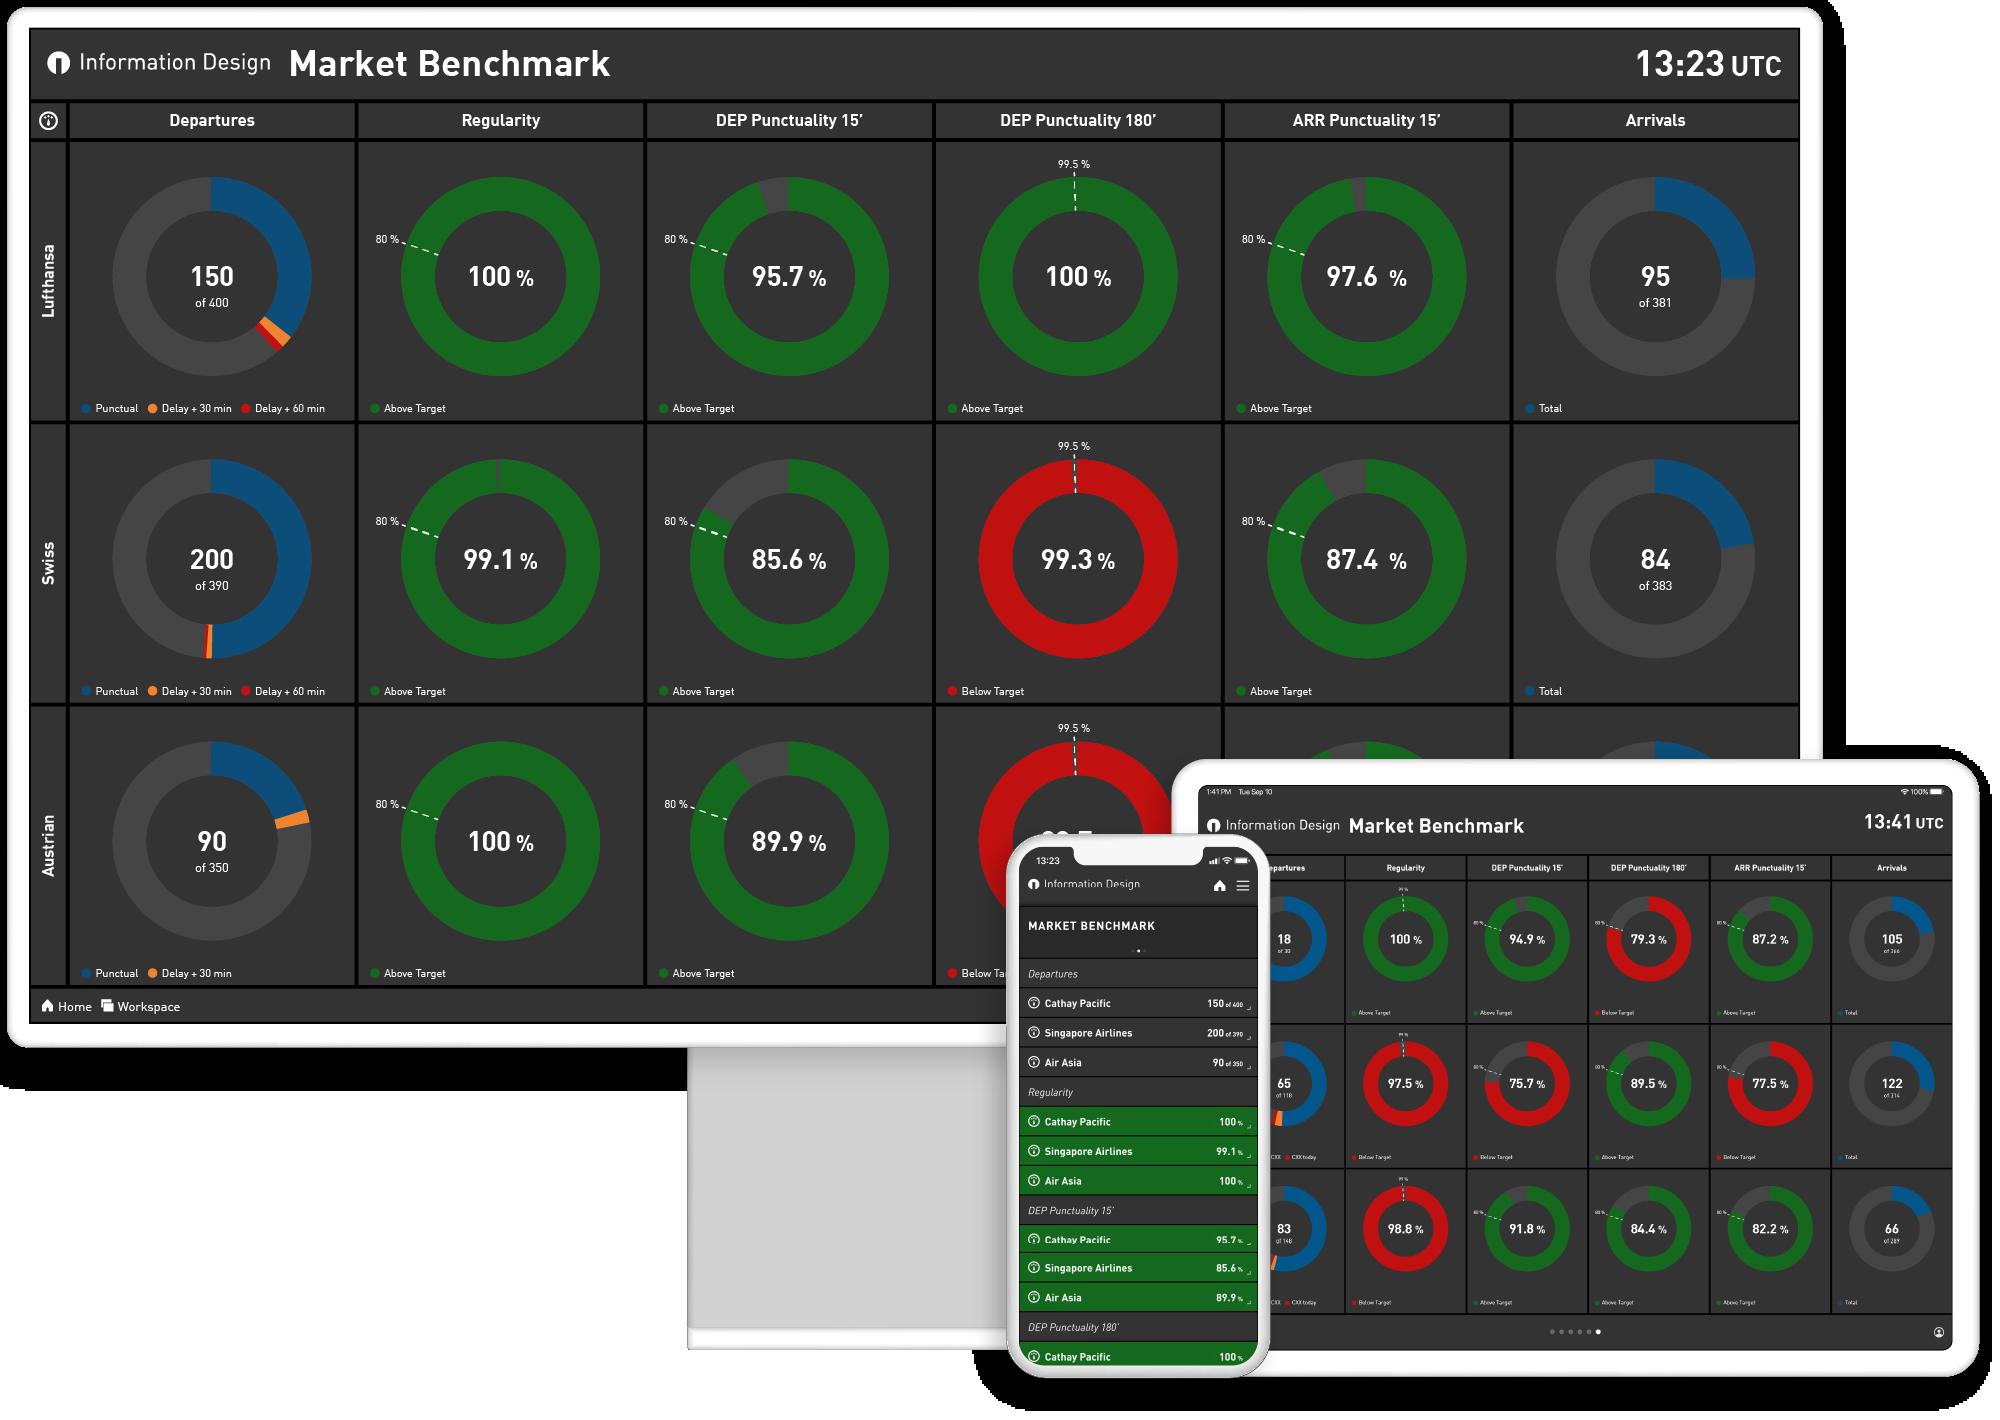 //www.id1.de/wp-content/uploads/2020/12/Market-Benchmark.png